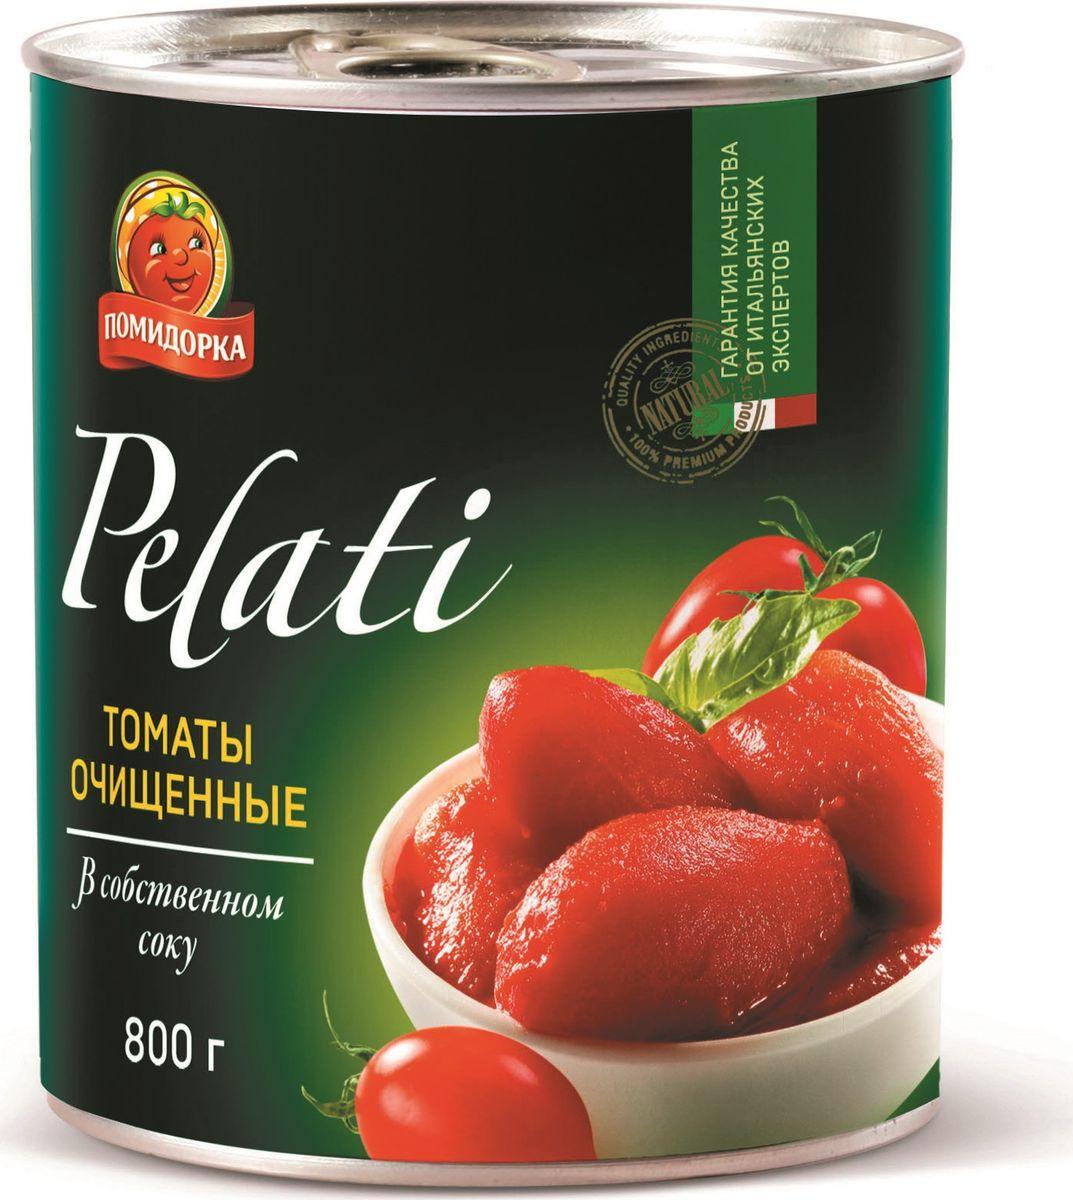 Помидорка Томаты очищенные, 850 мл vegda томаты очищенные италия 425 мл